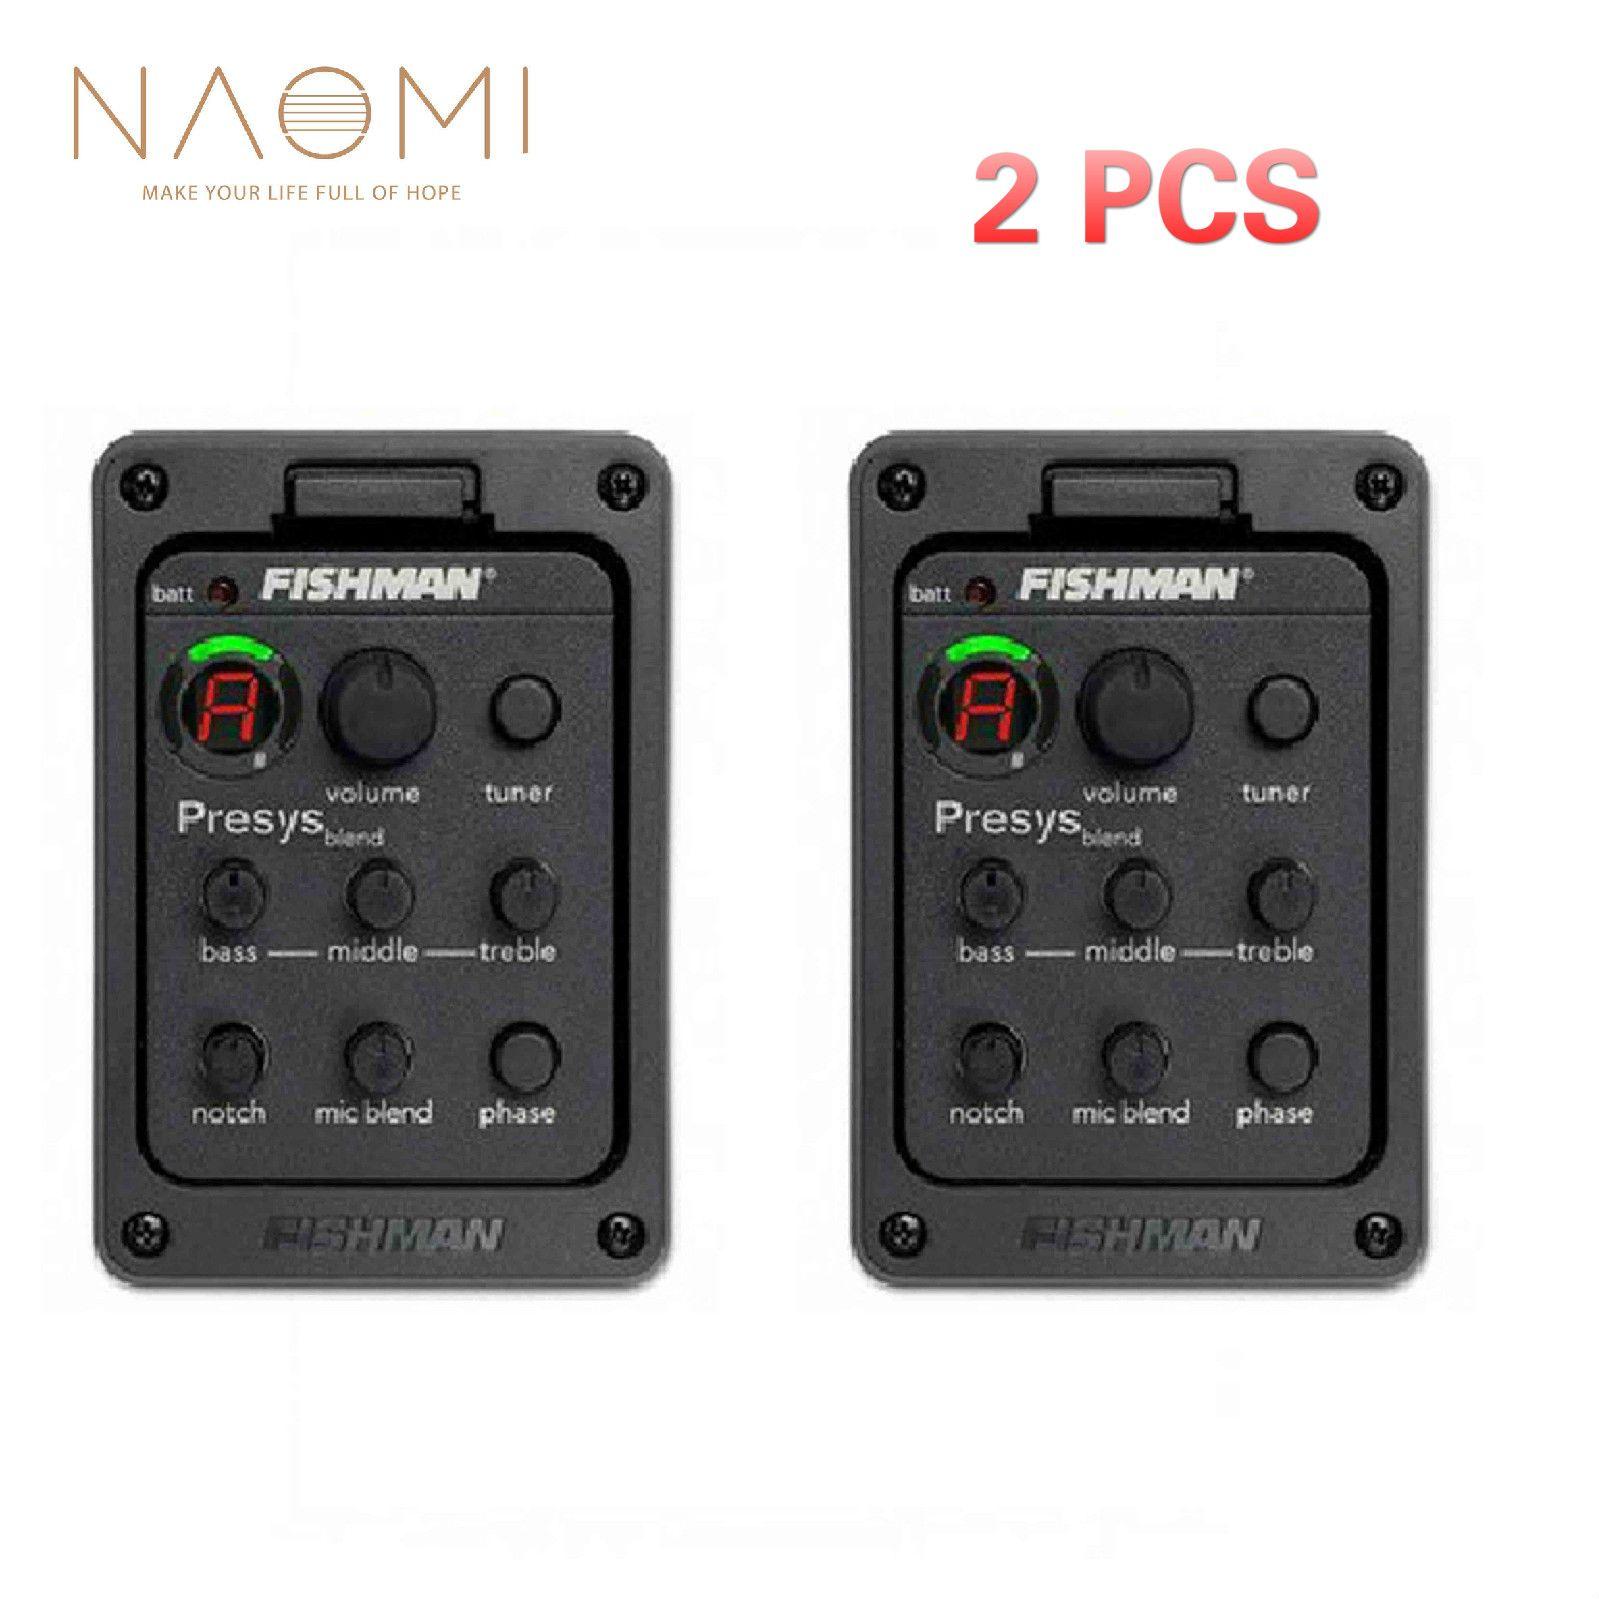 NAOMI 2 Pcs Fishman Presys 301 Mic Blend Dual Model Guitar Preamp EQ Tuner Piezo Pickup Beat Guitar Parts Accessories New